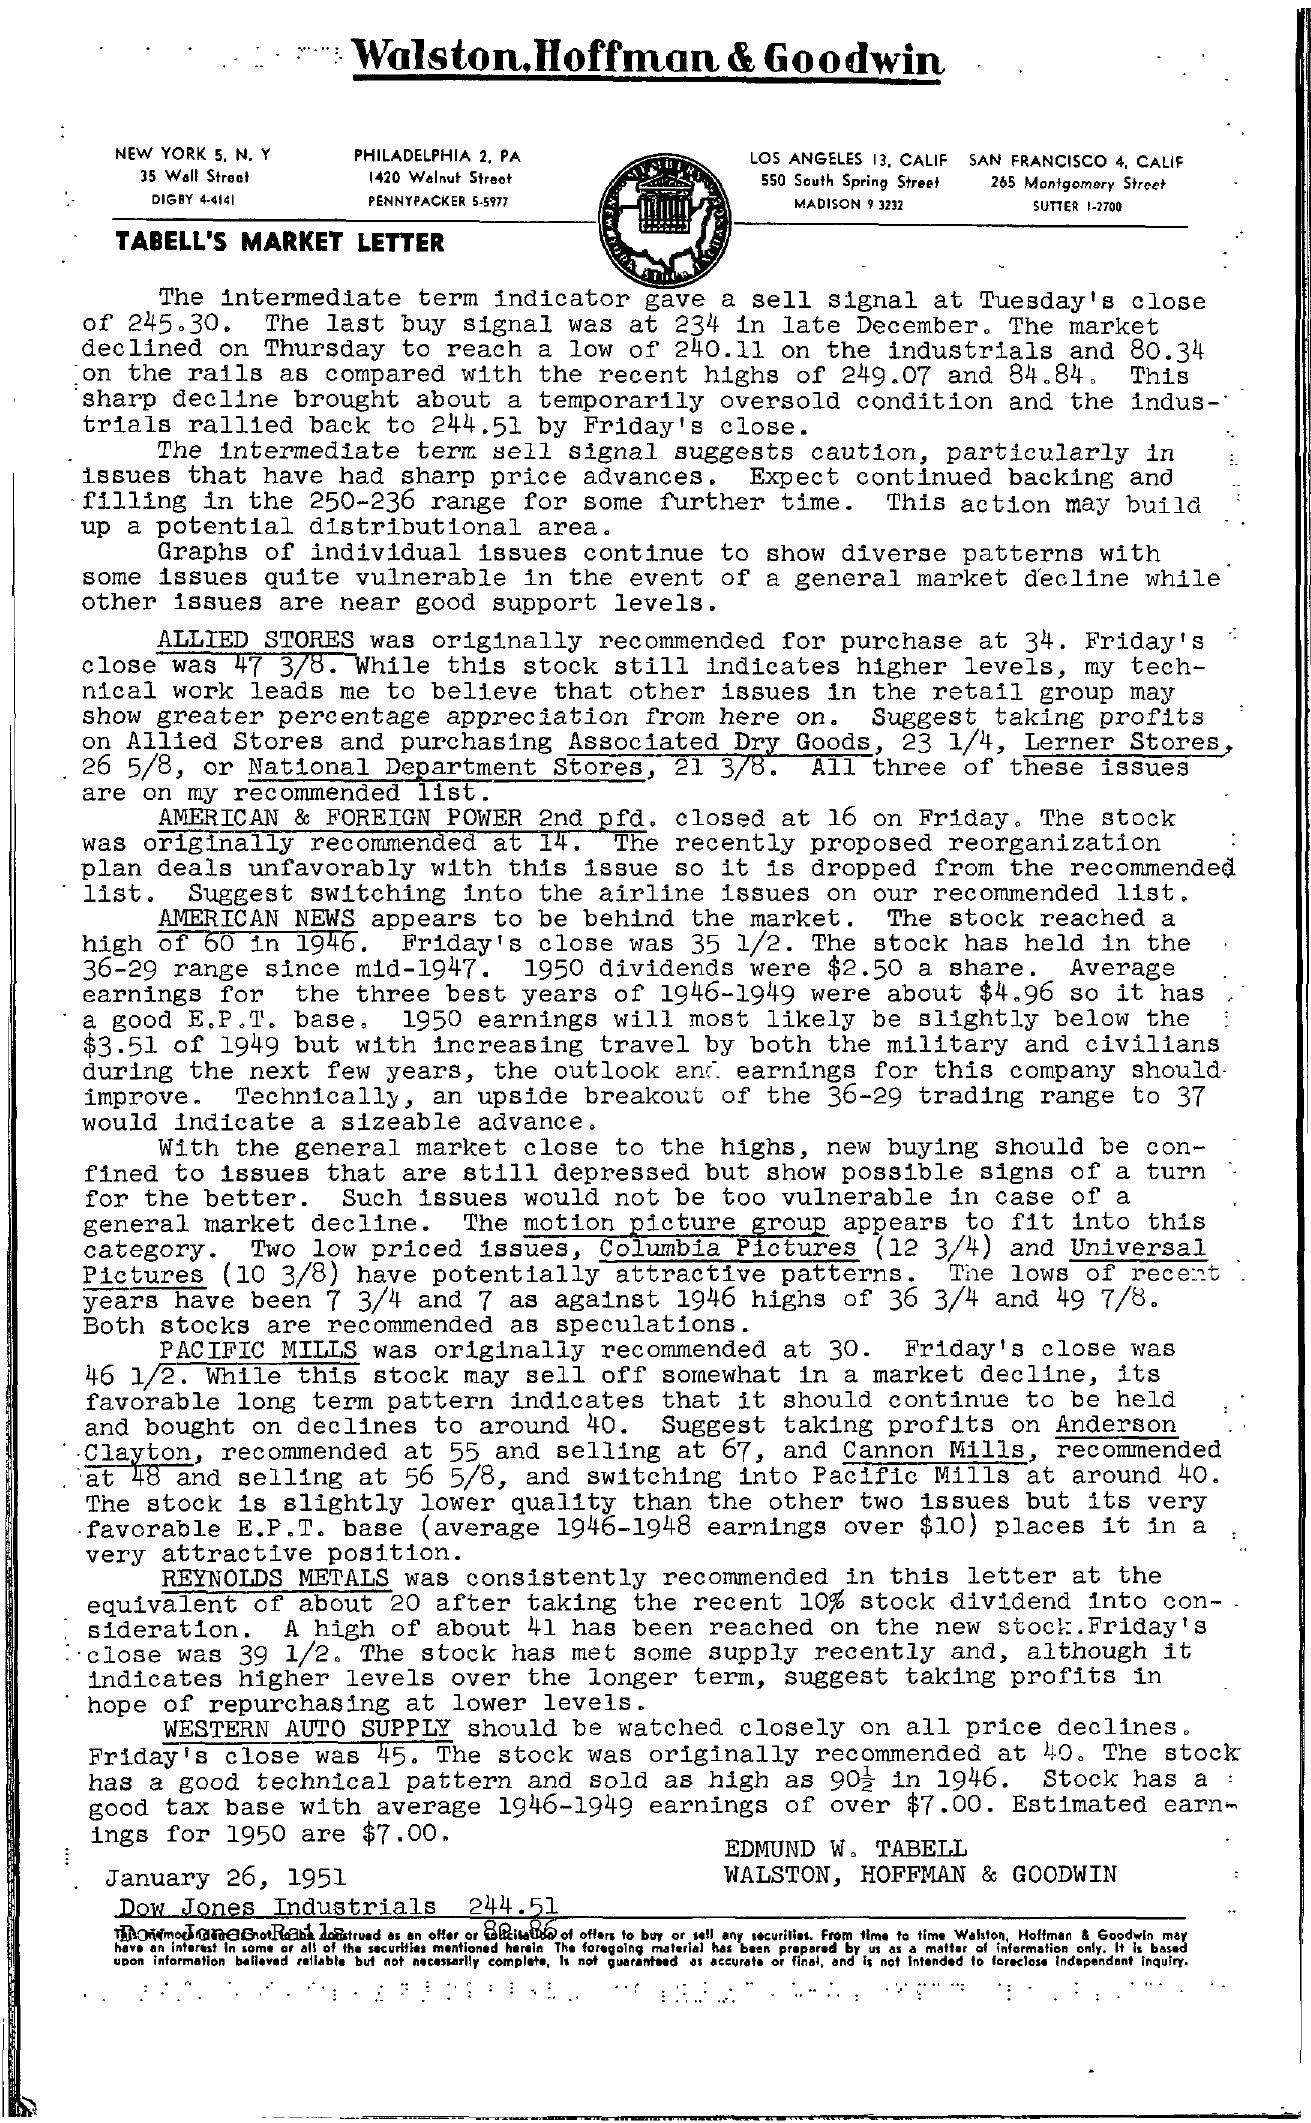 Tabell's Market Letter - January 26, 1951